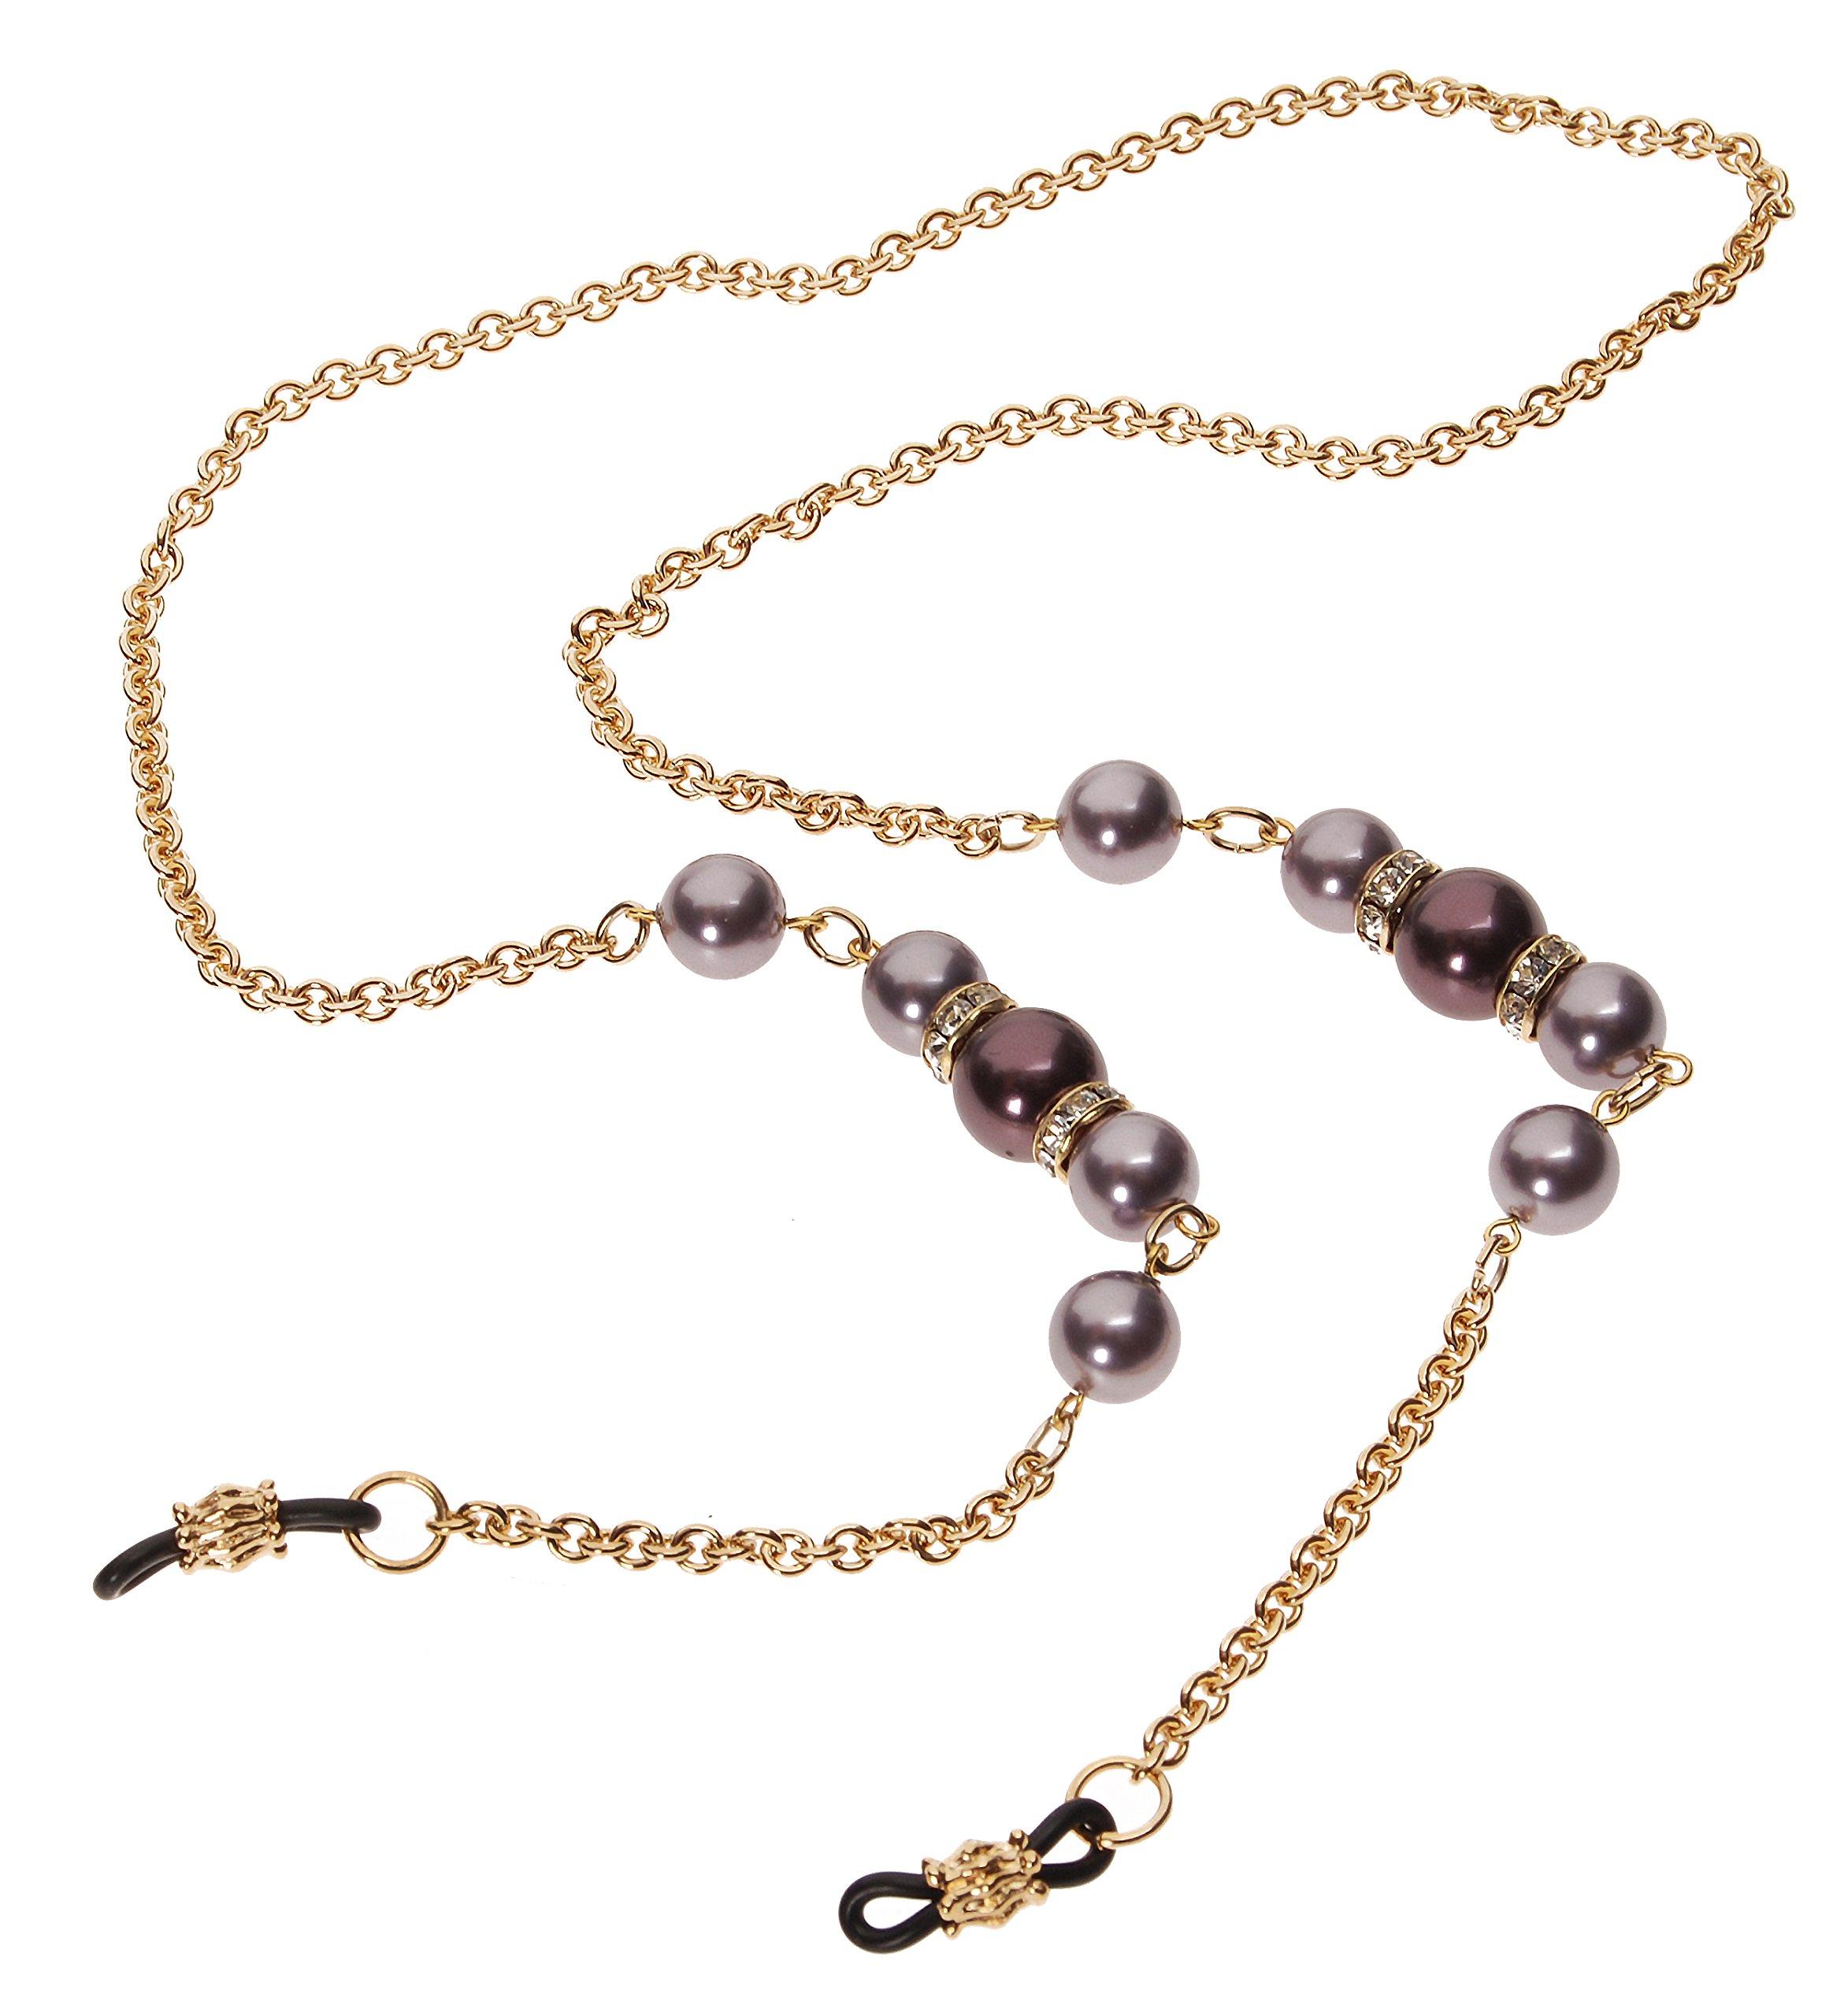 L. Erickson Cadabra Eyeglass Chain - Burgundy Pearl/Mauve Pearl/Crystal/Gold